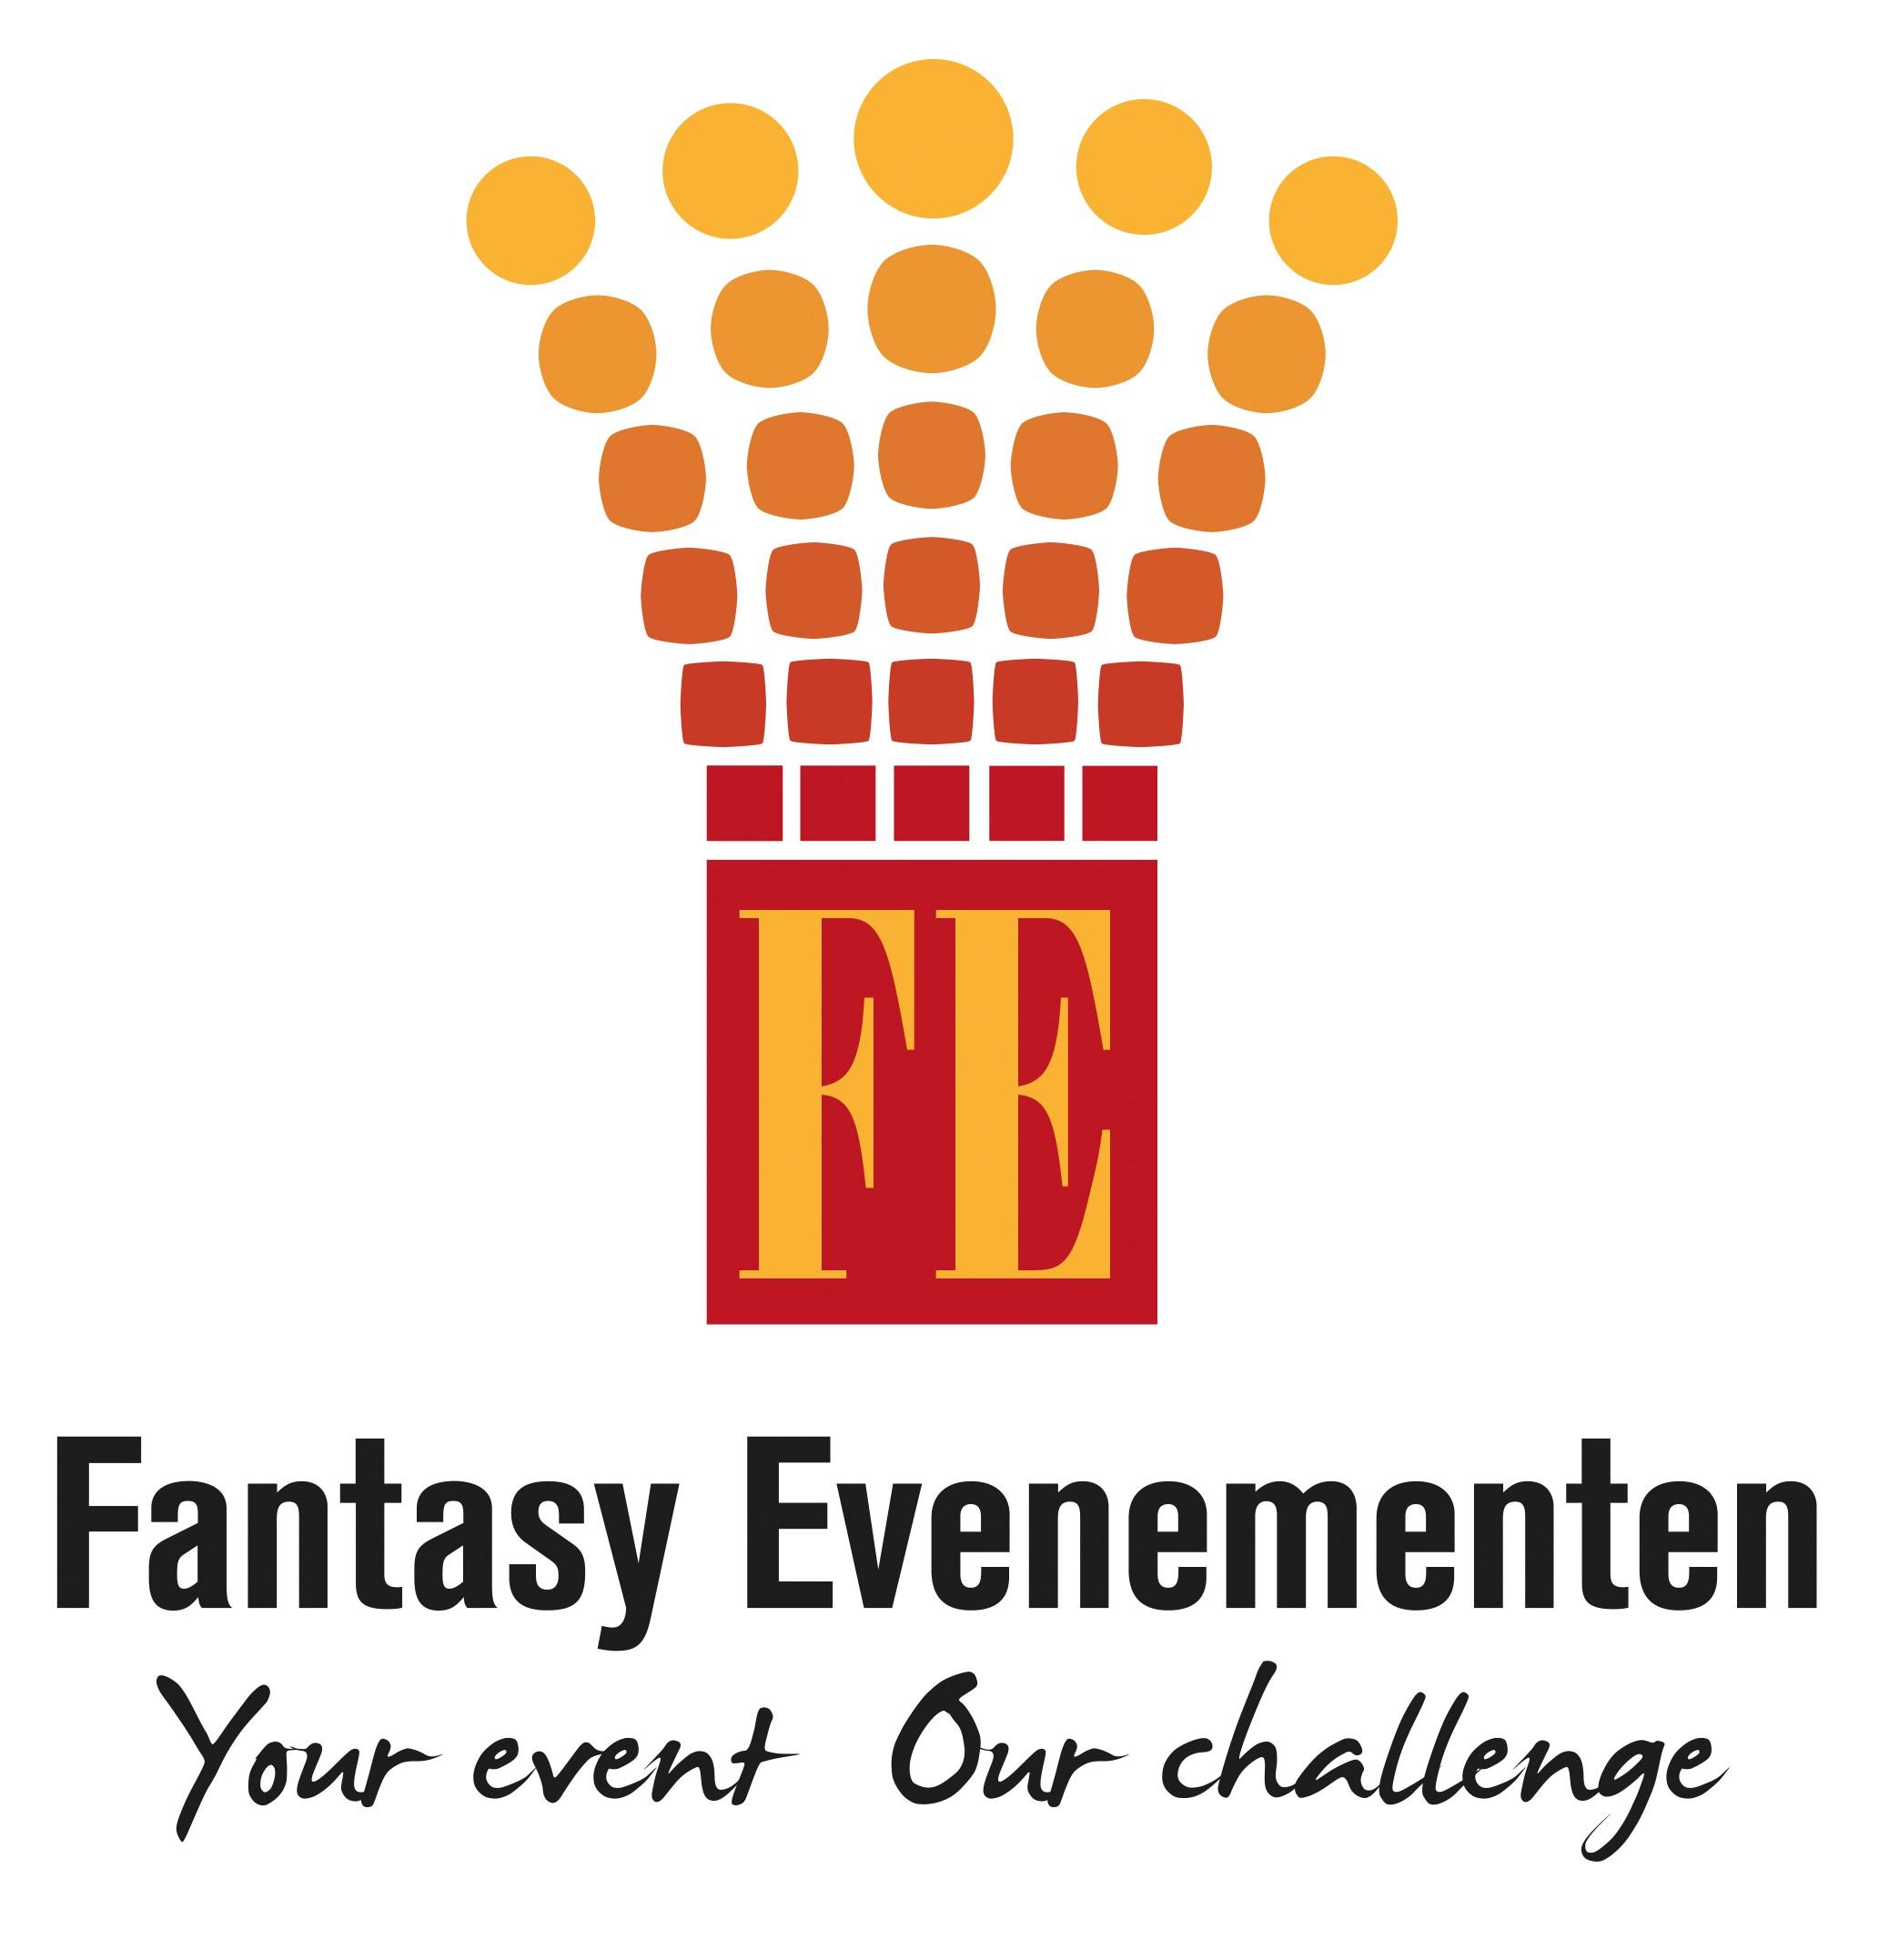 Fantasy Evenementen